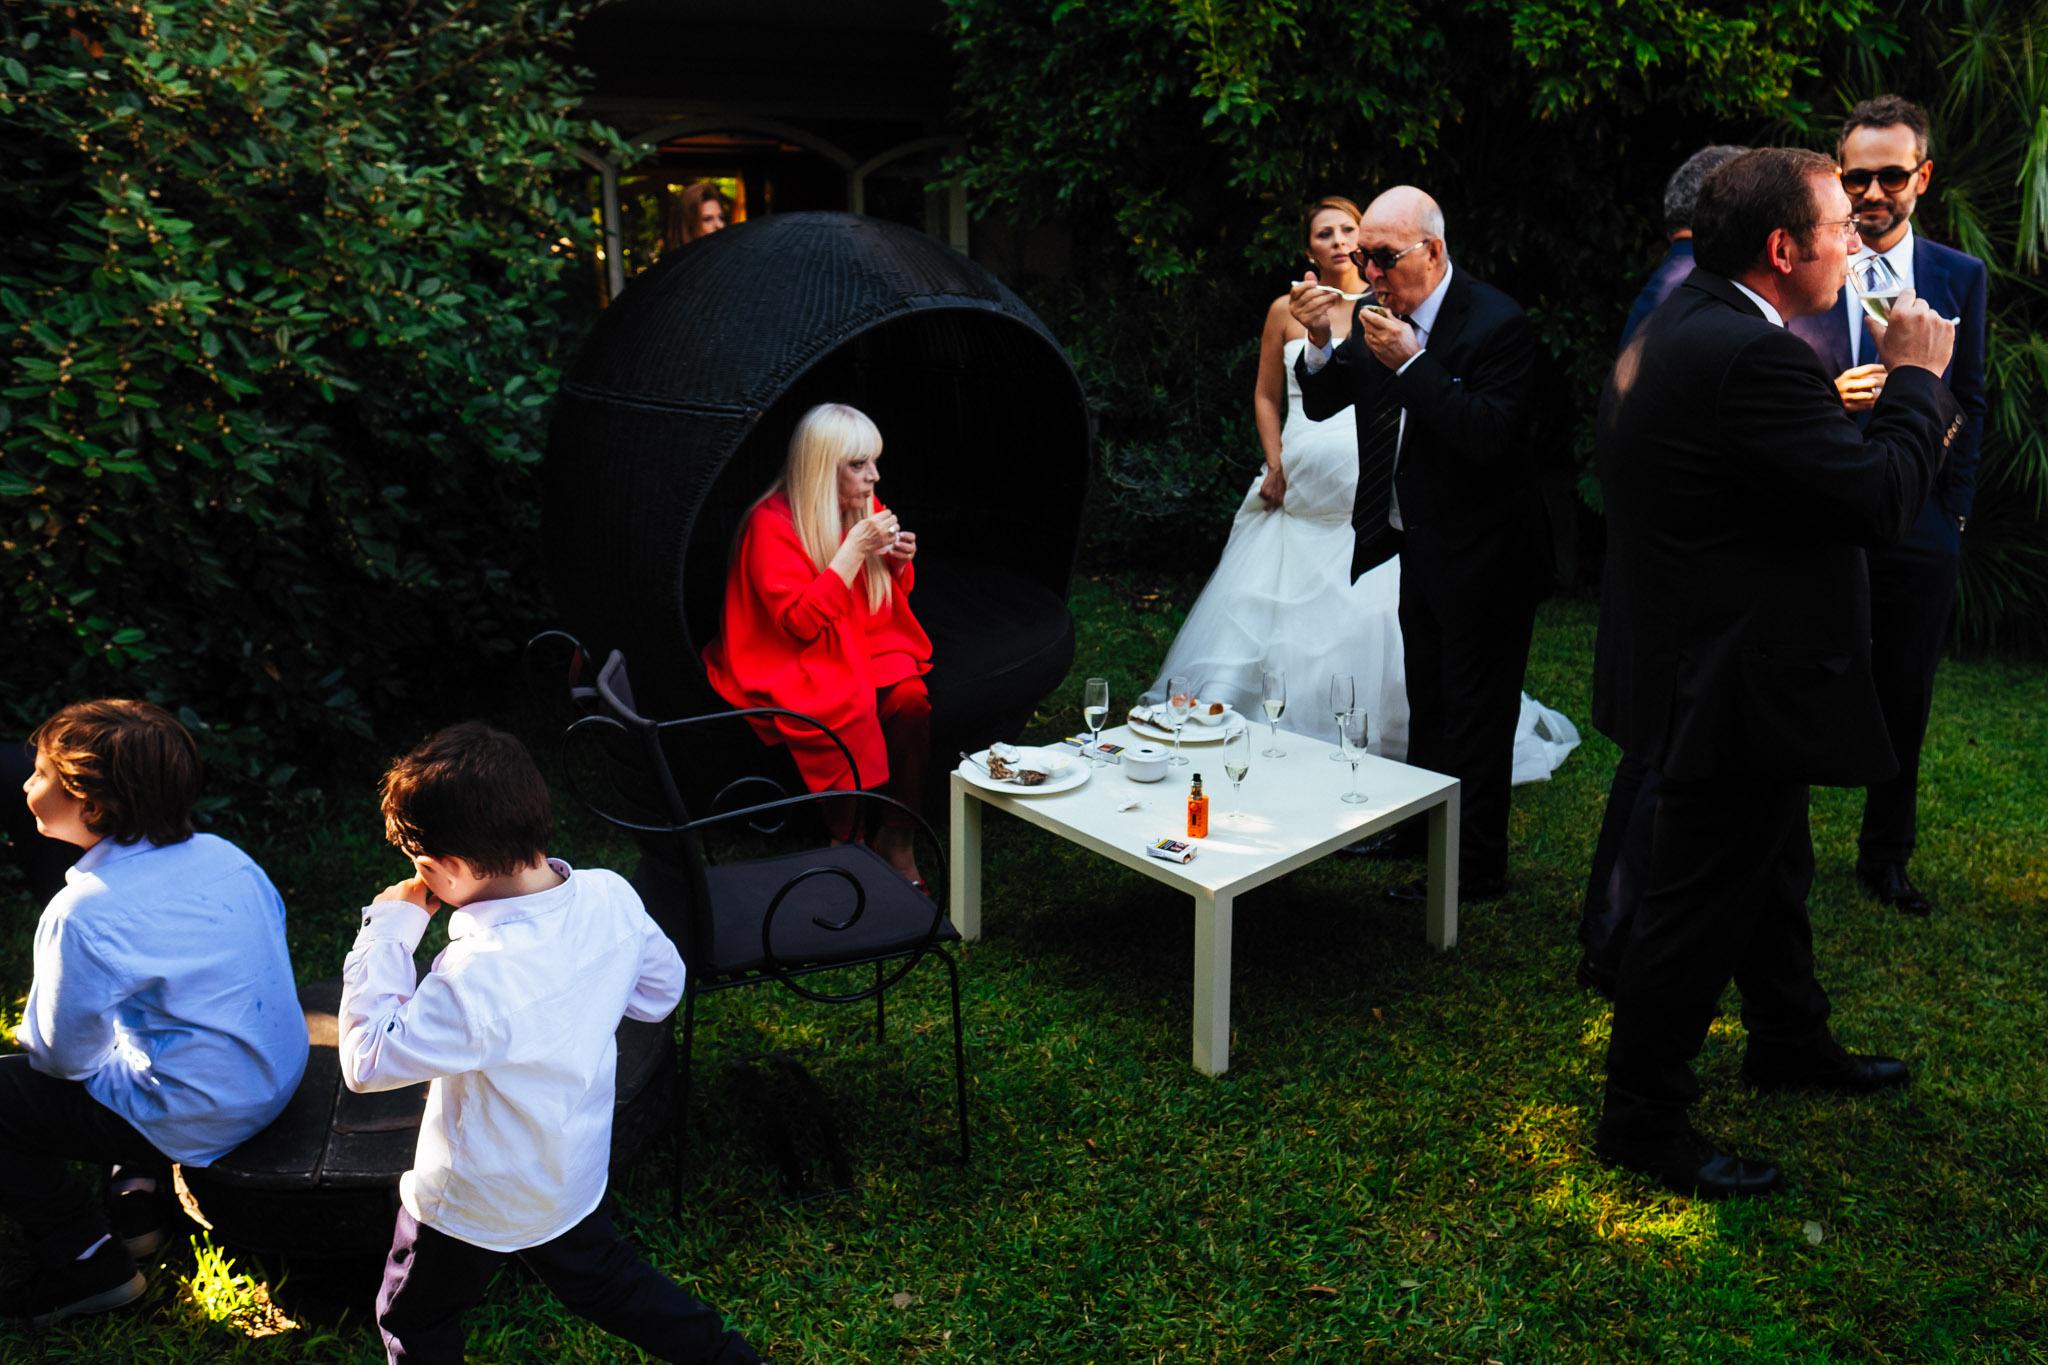 matrimonio-a-catania-57.jpg